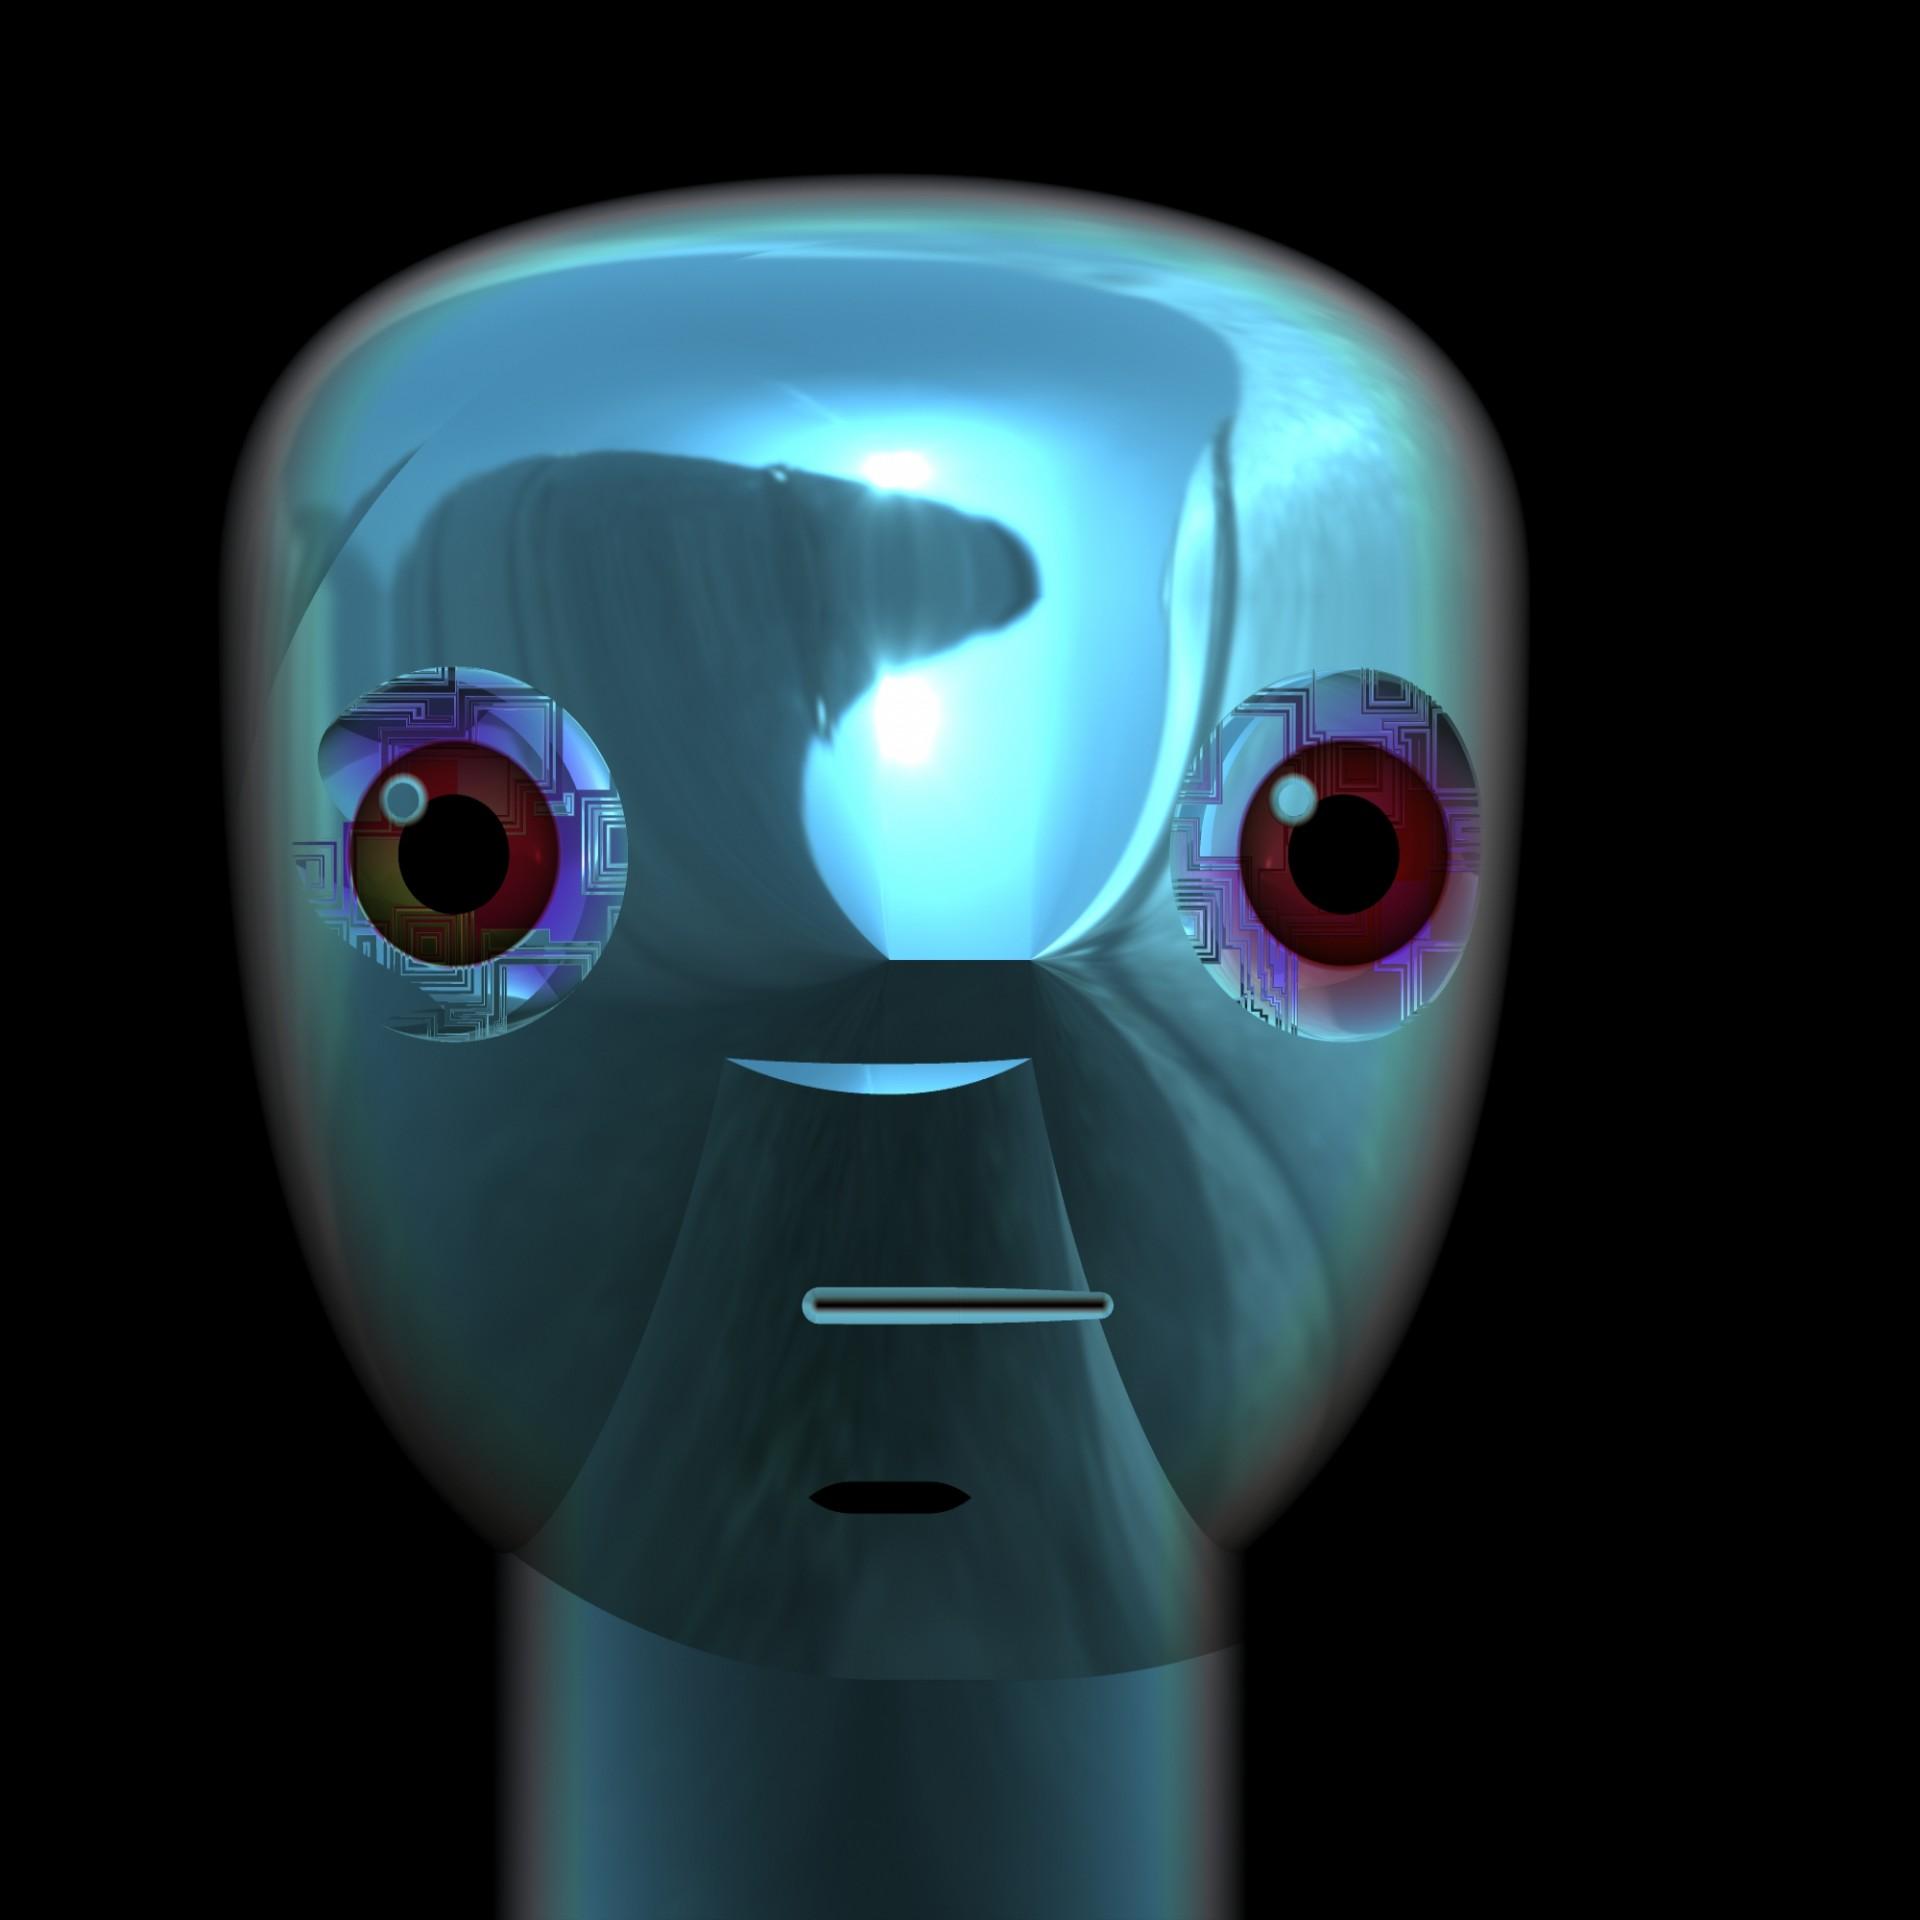 droid-prototype.jpg